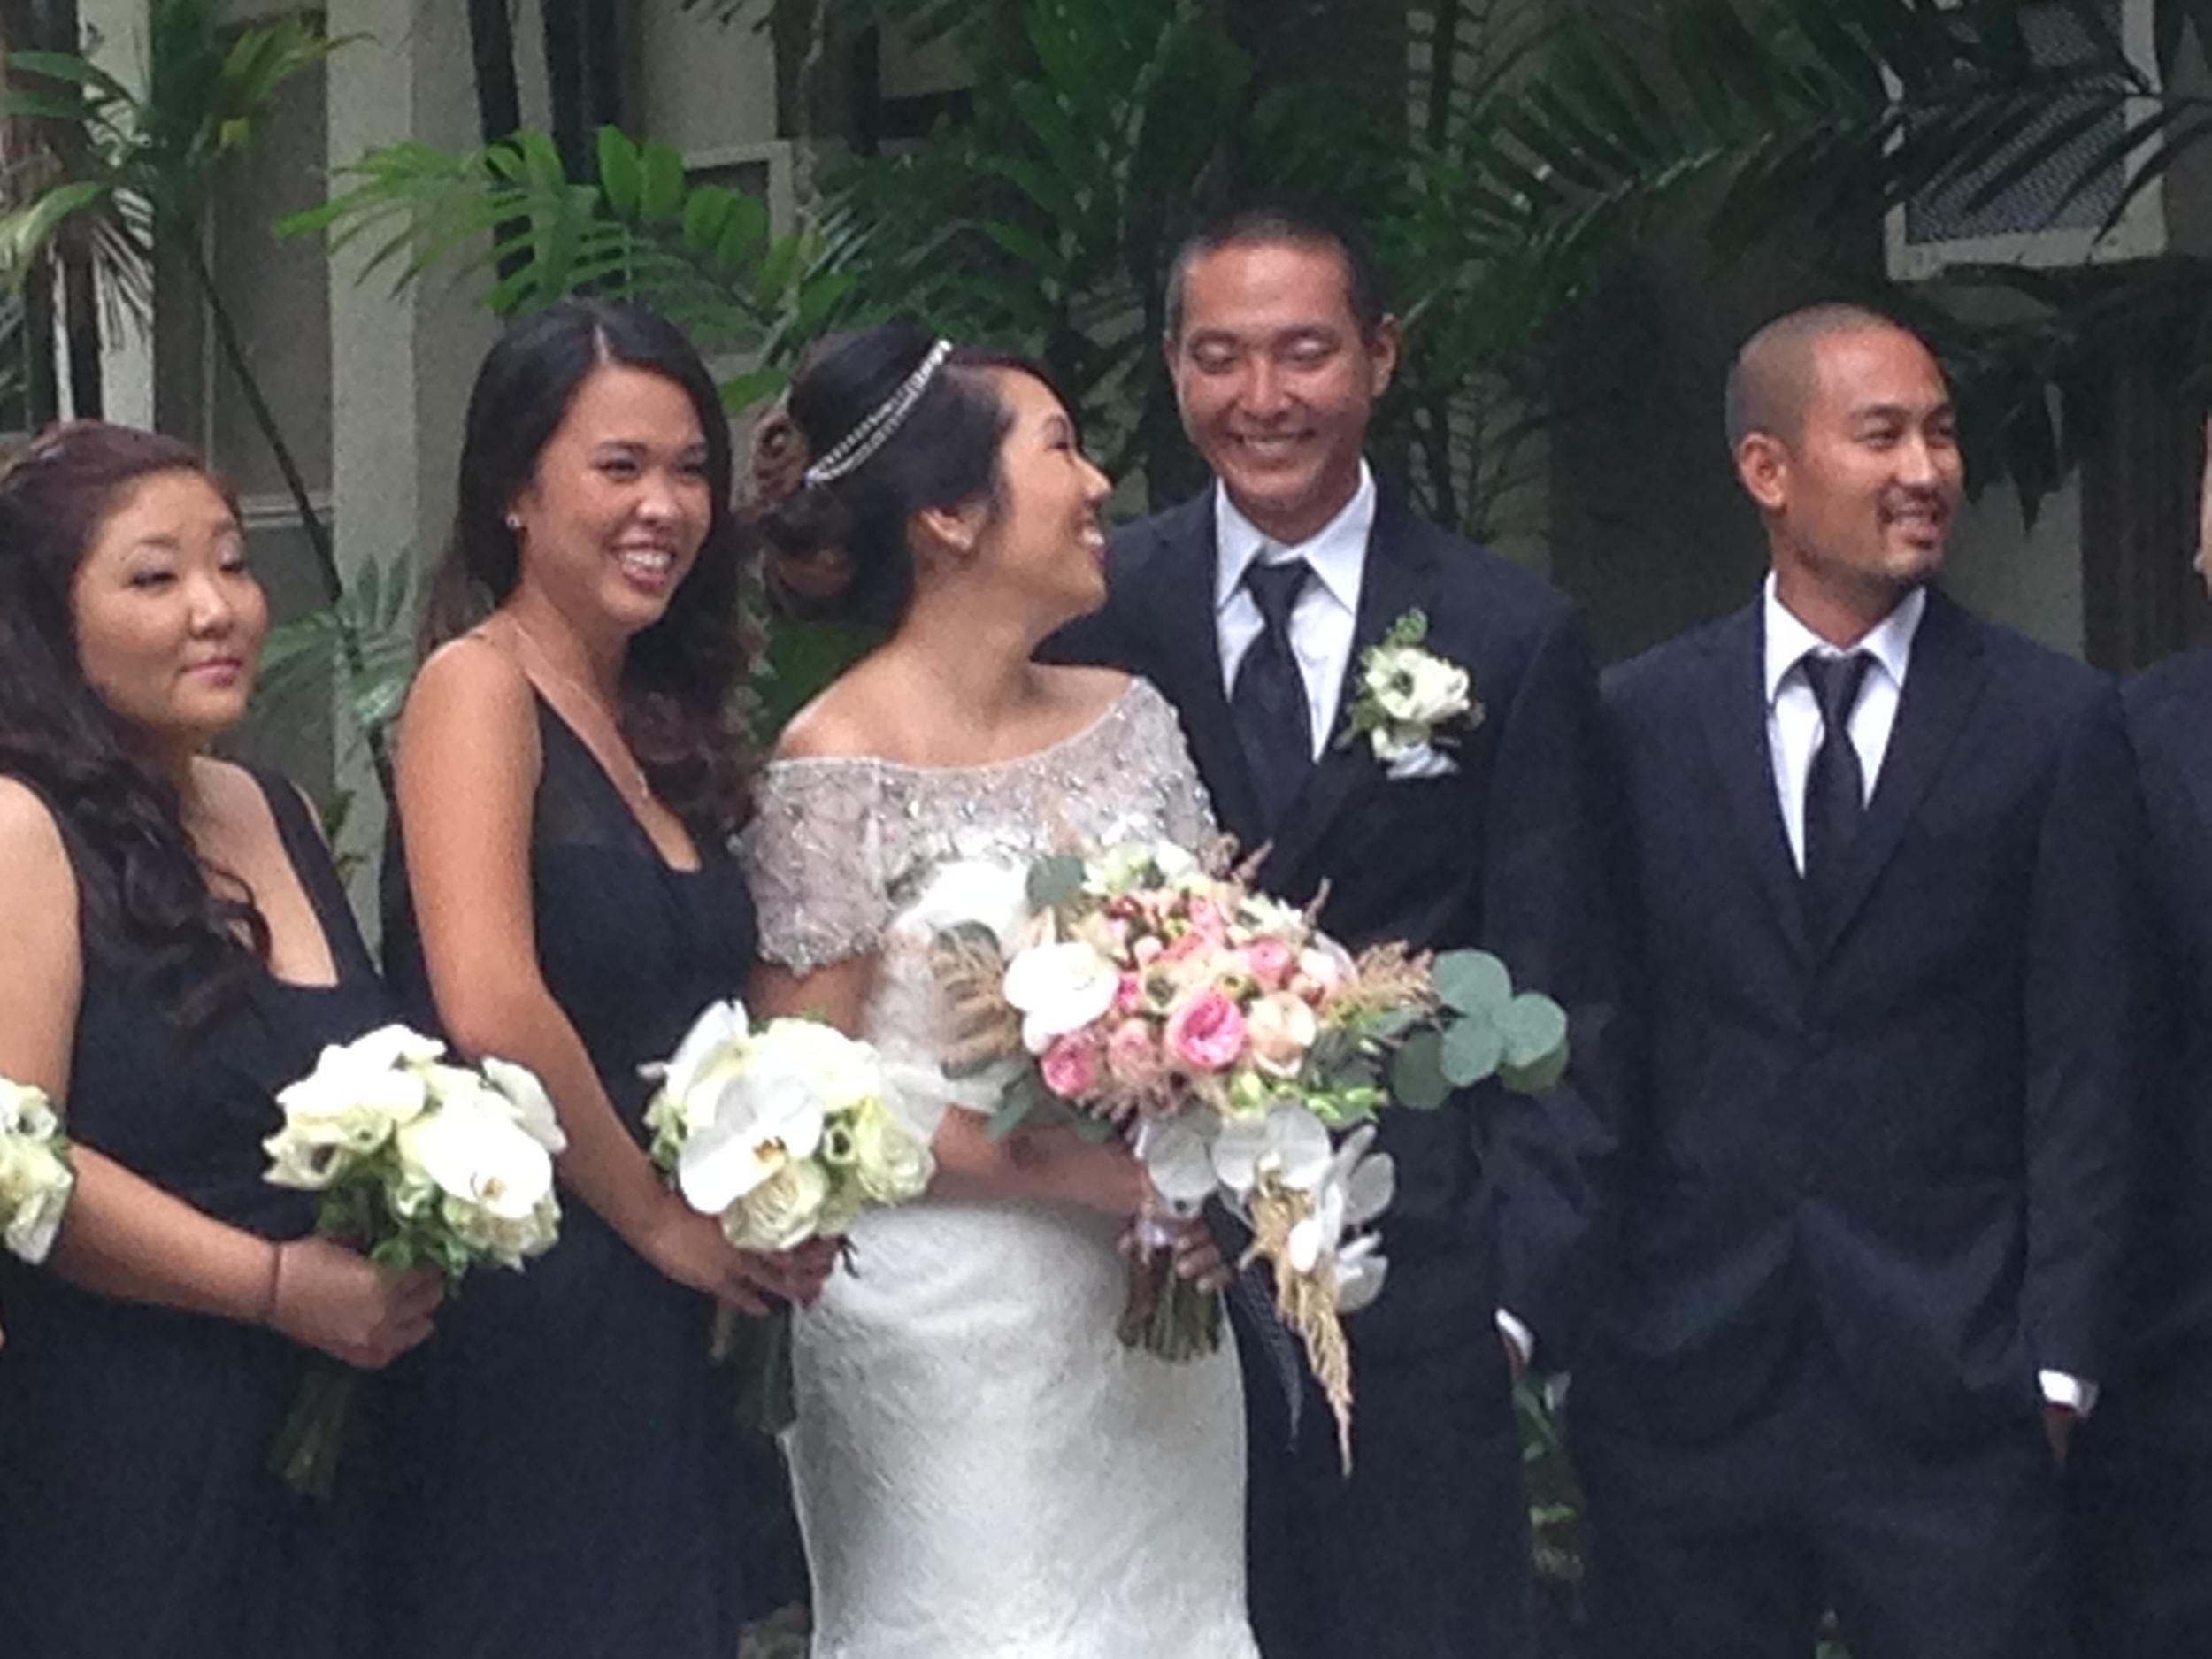 5-bishop-museum-wedding.JPG